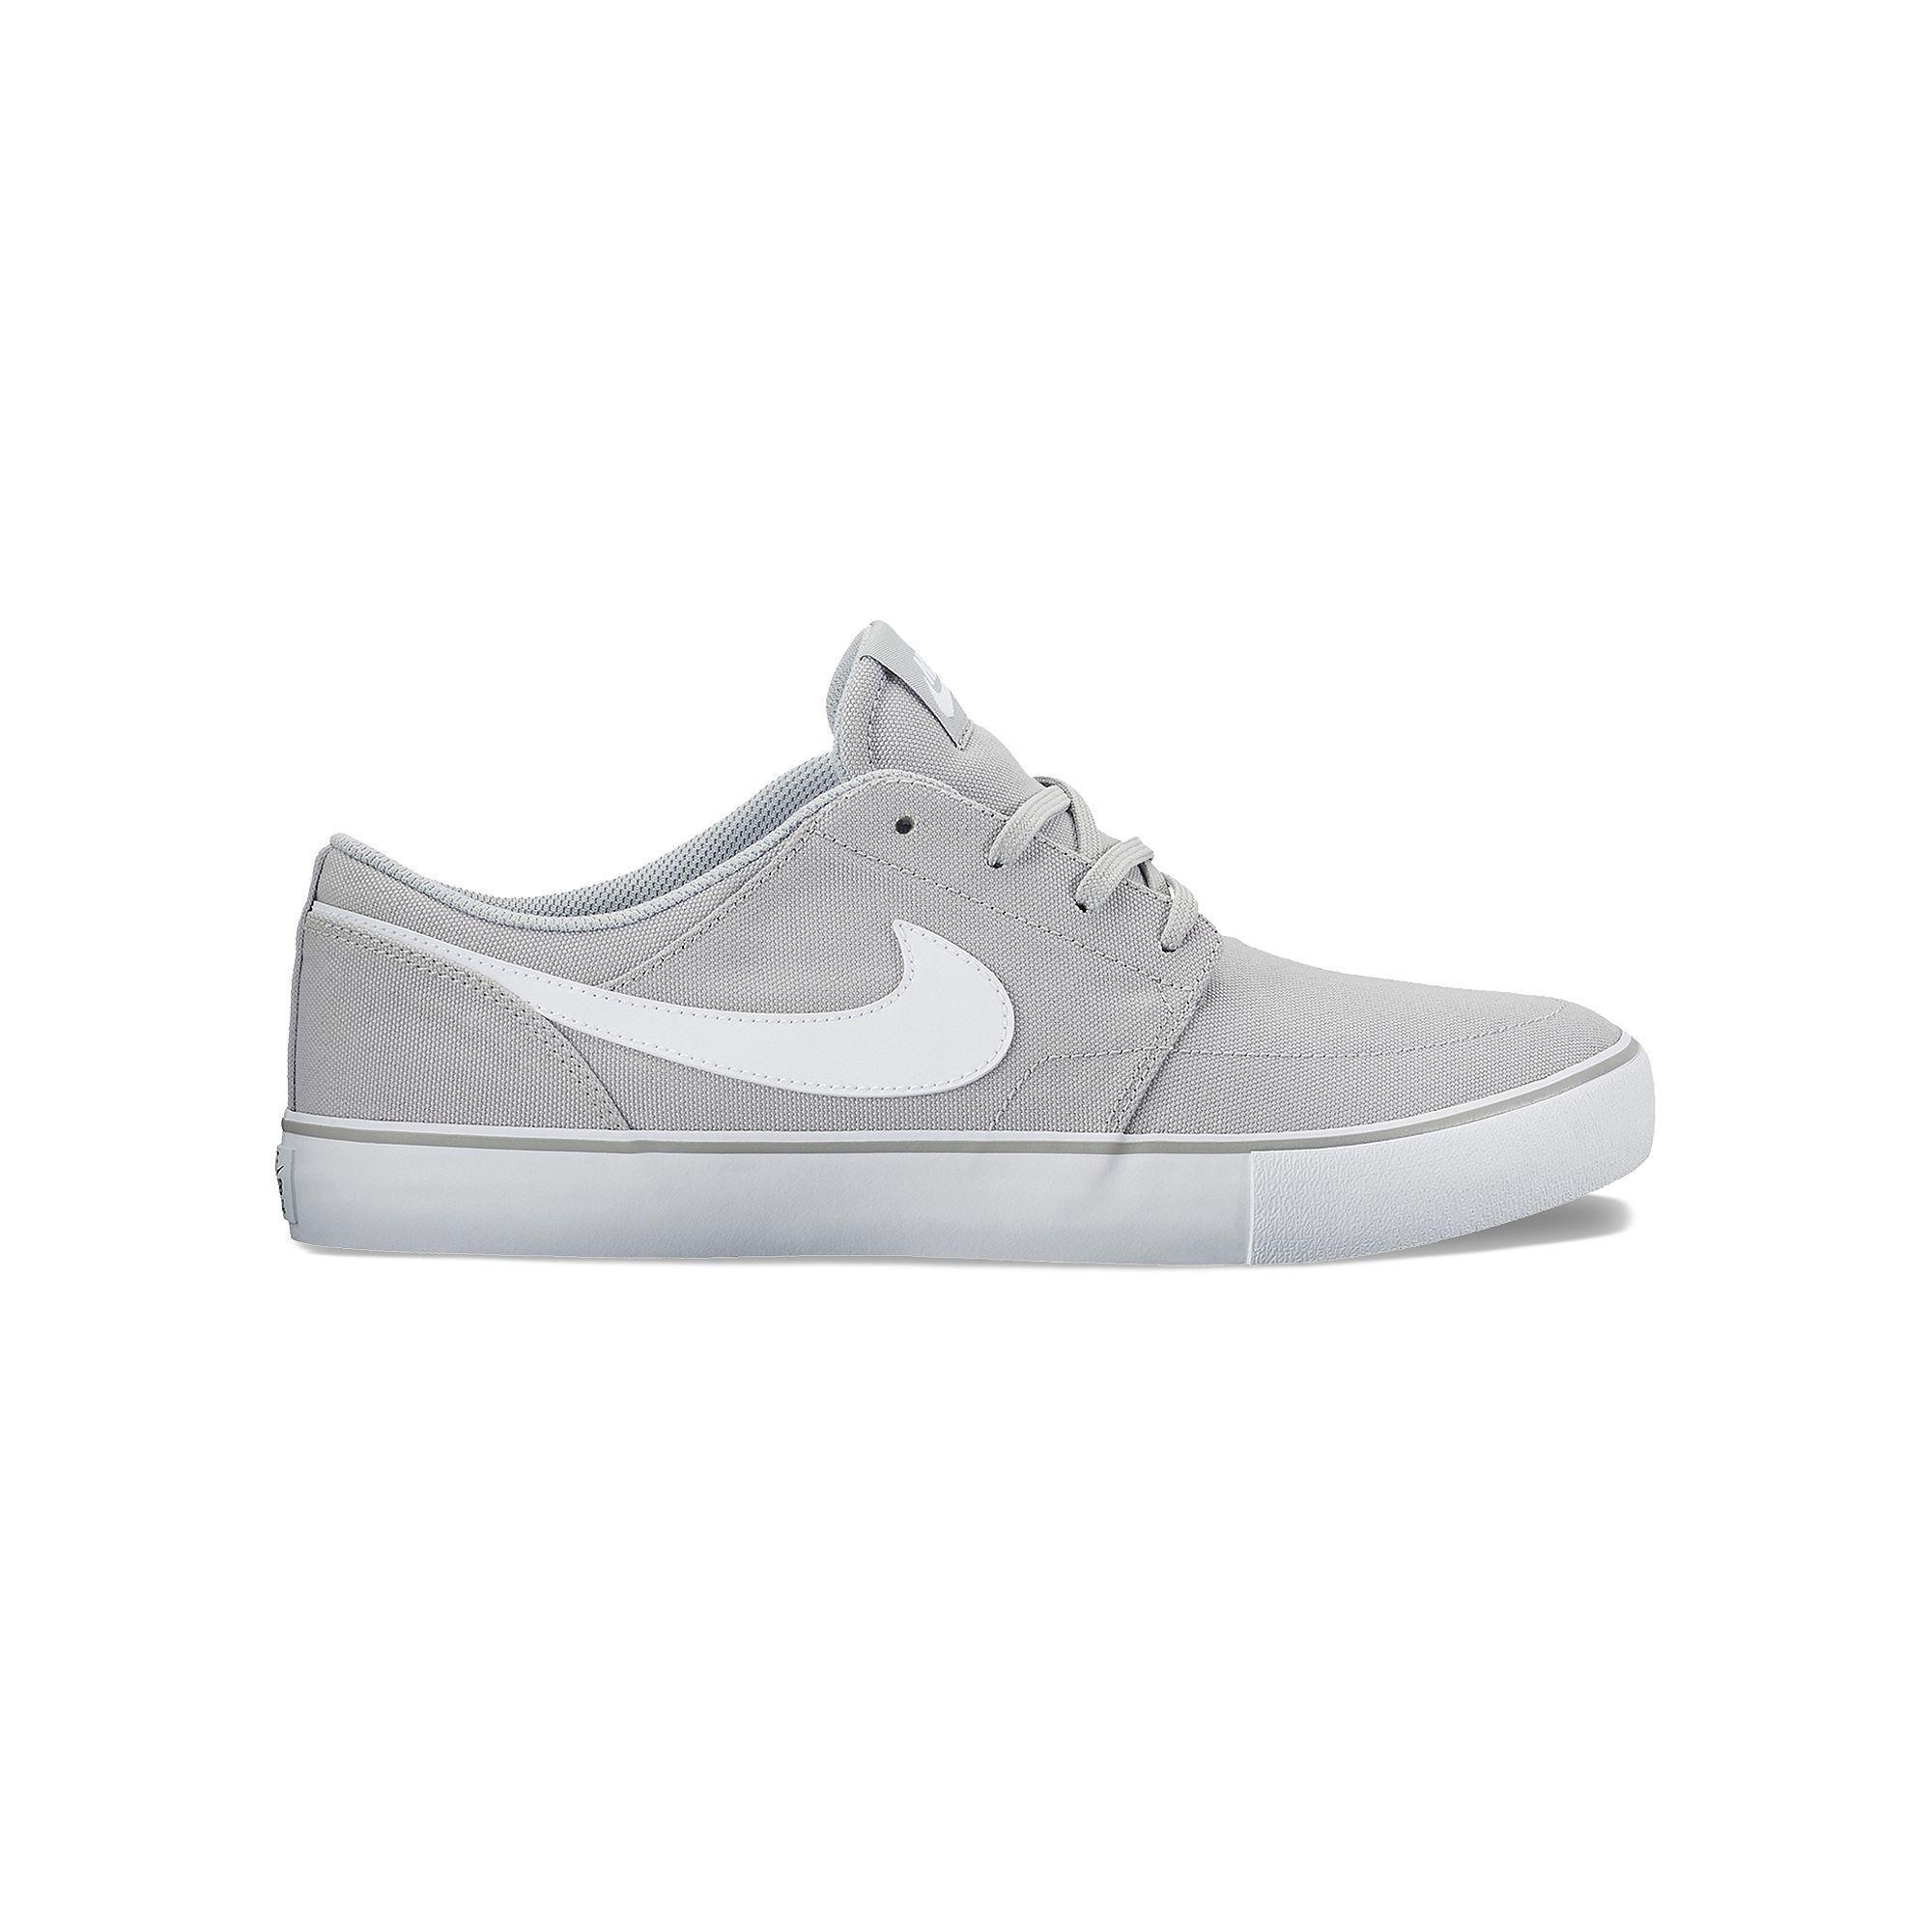 Nike SB Solarsoft Portmore II Men's Skate Shoes, Size: 11.5, Grey (Charcoal